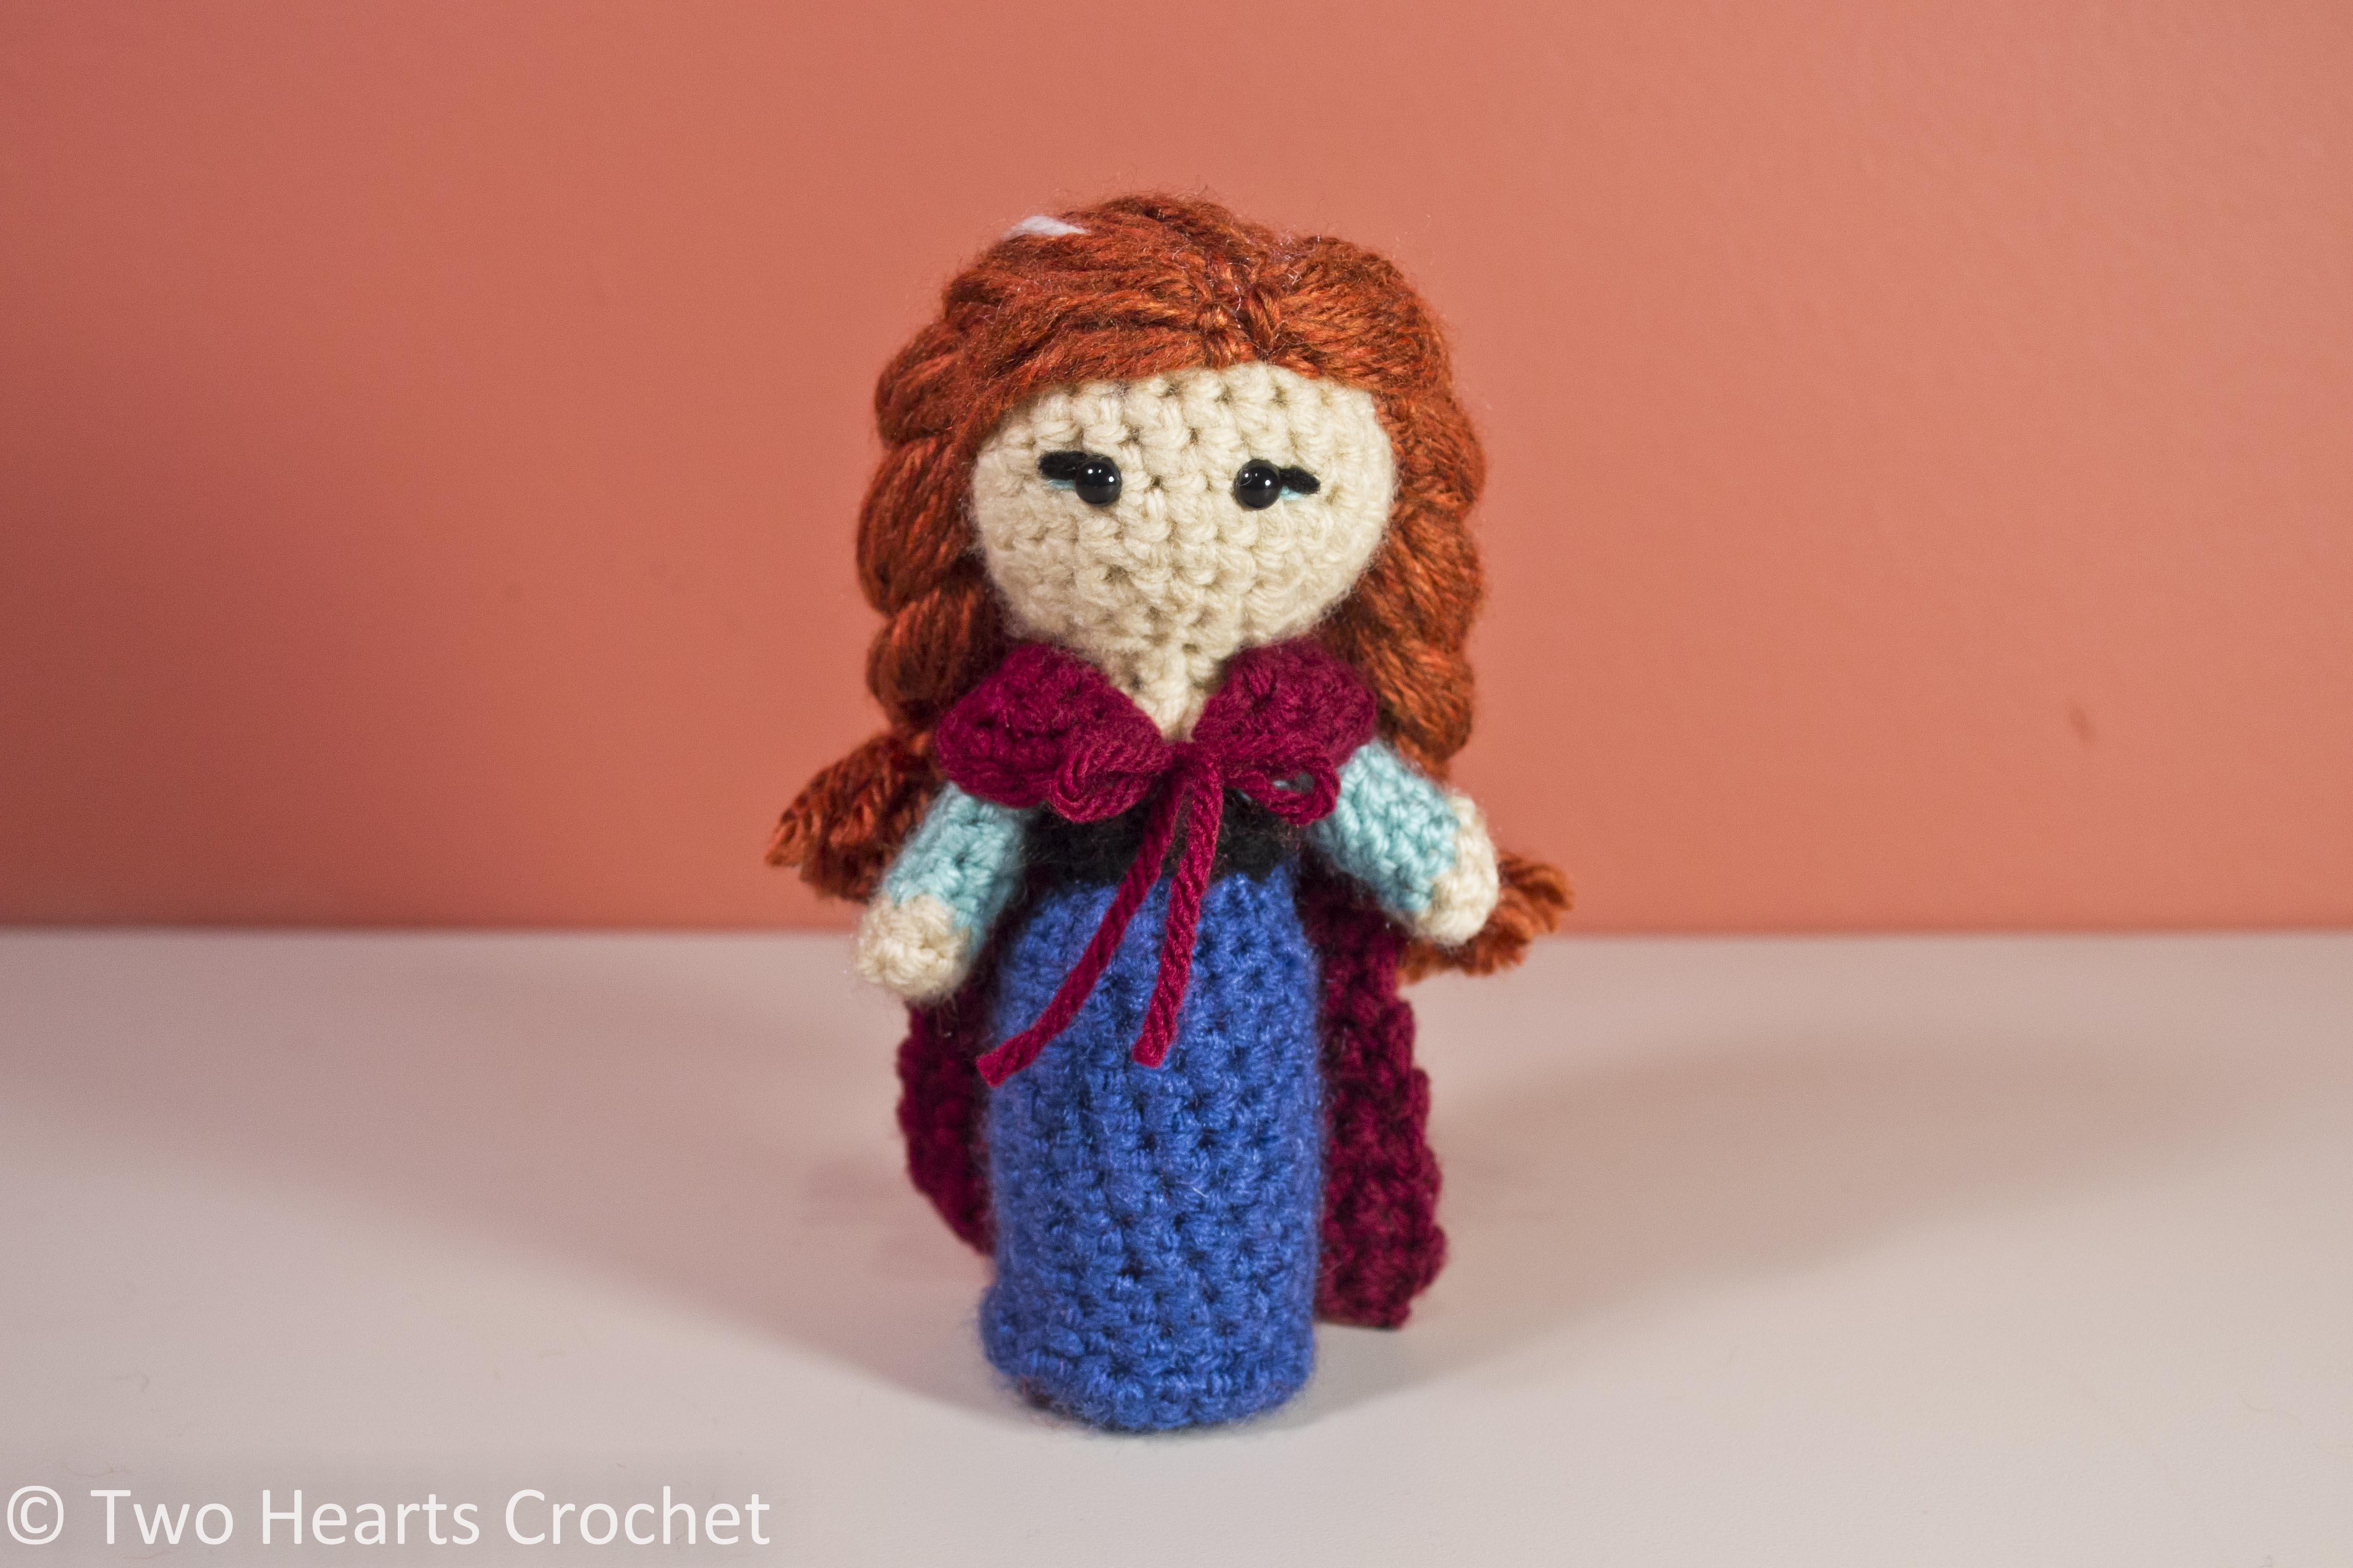 Amigurumi Crochet Frozen : Princess Pattern: Anna (Frozen) Amigurumi Two Hearts Crochet